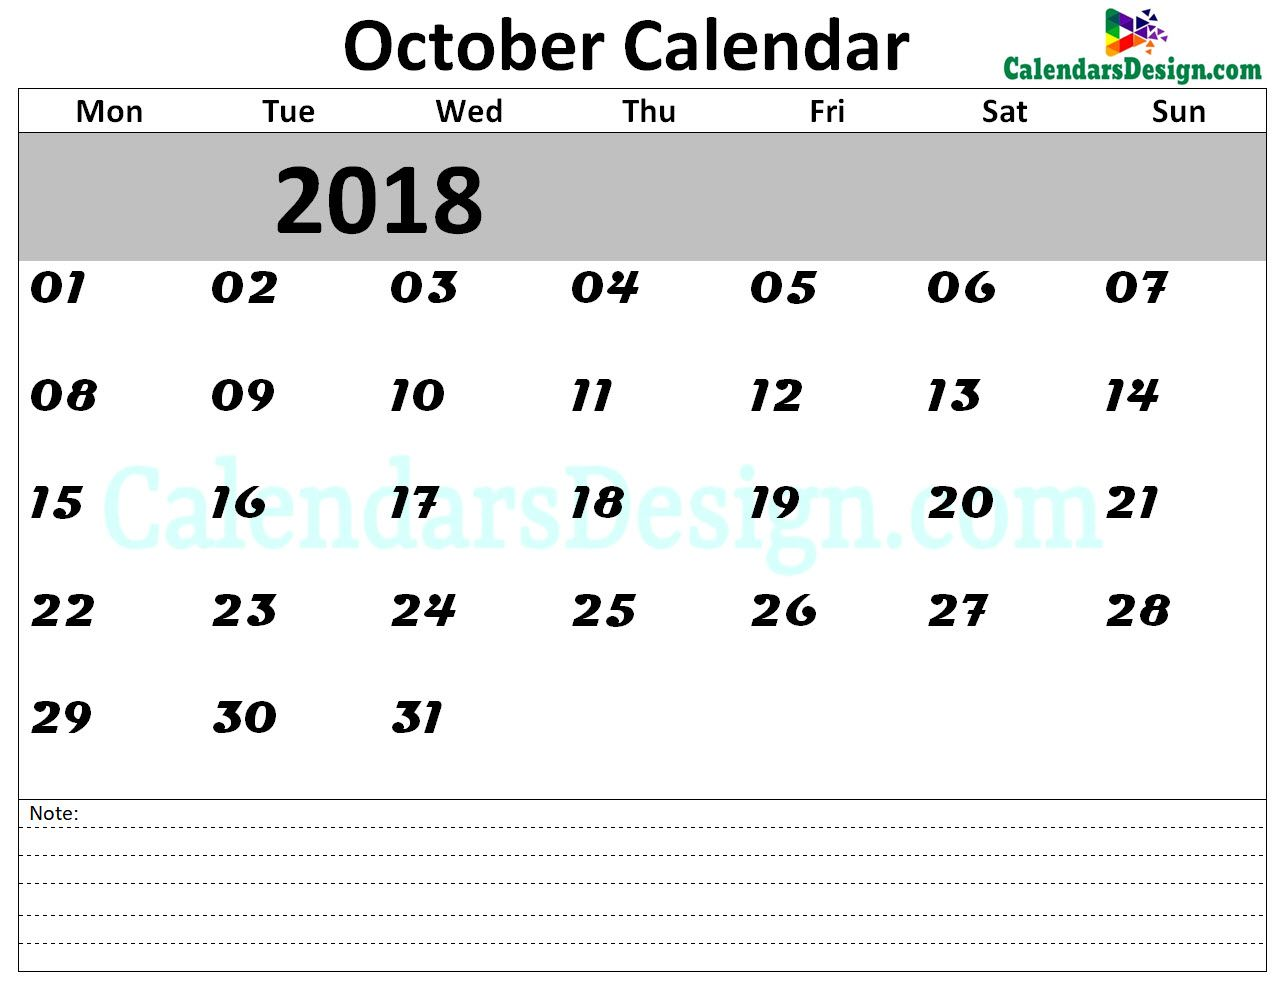 October 2018 Calendar Template October Calendar 2018 Template 2018